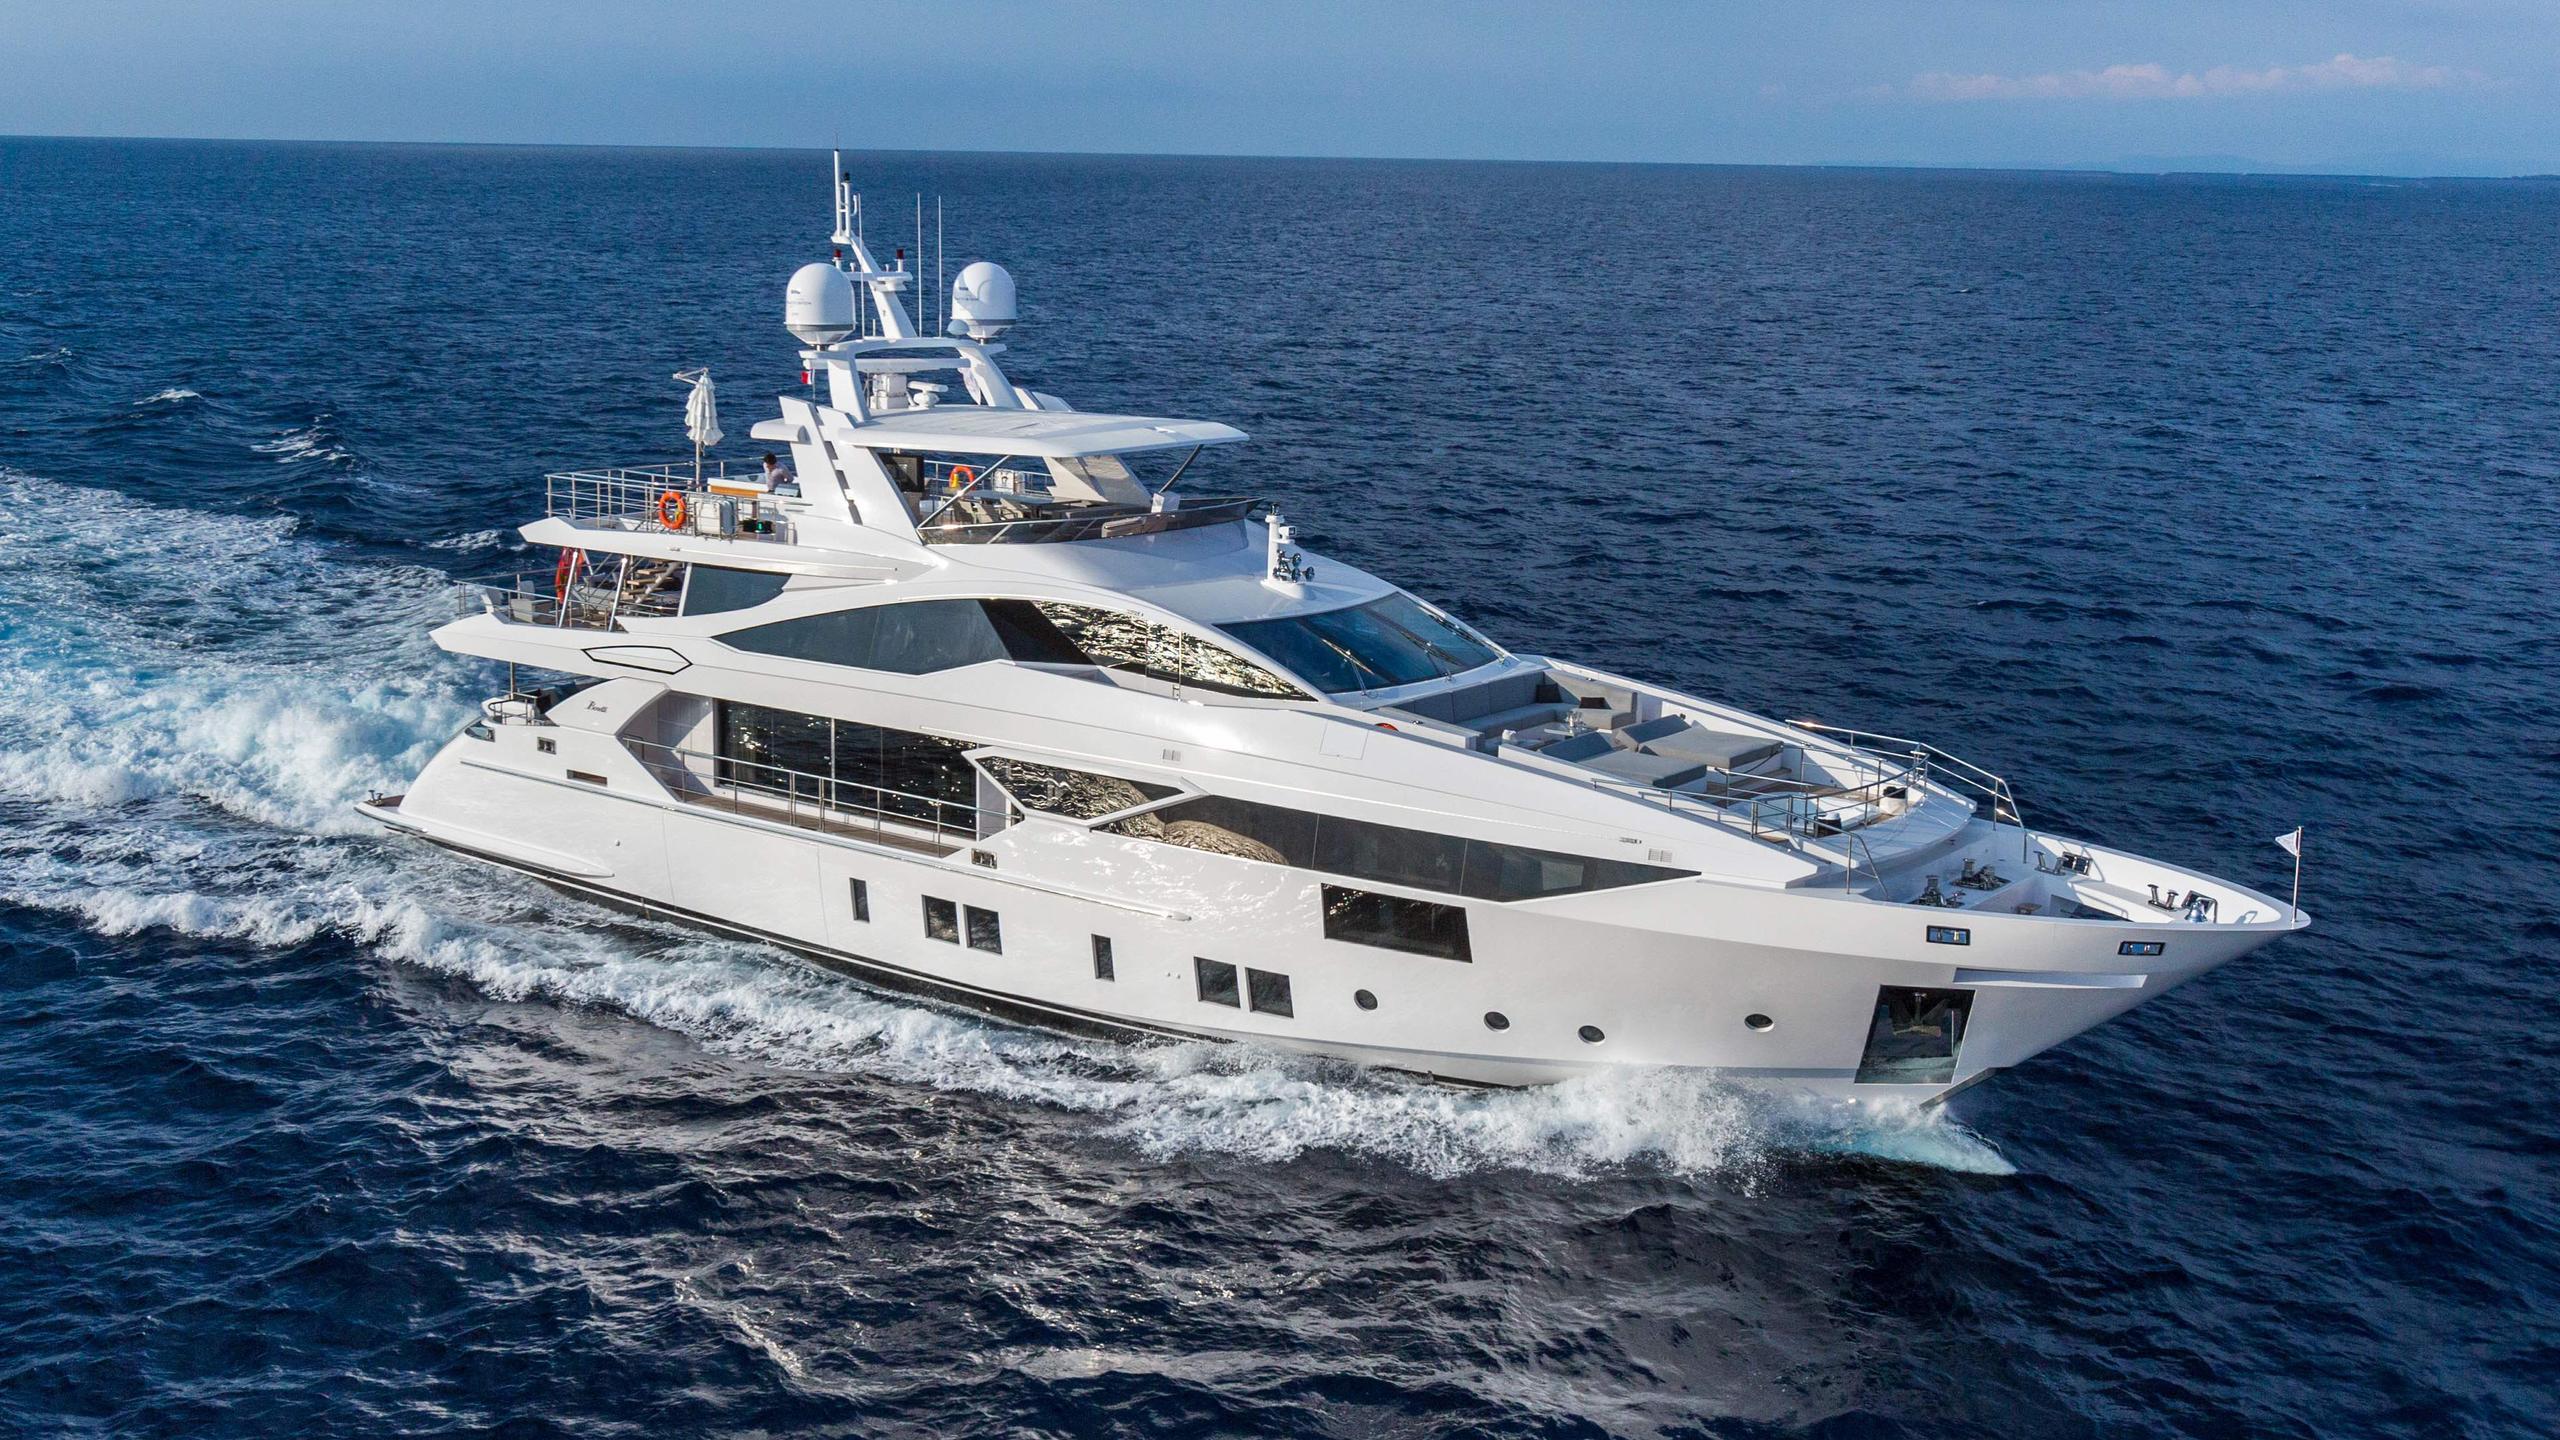 skyler-motoryacht-benetti-vivace-125-2017-38m-running-half-profile-sistership